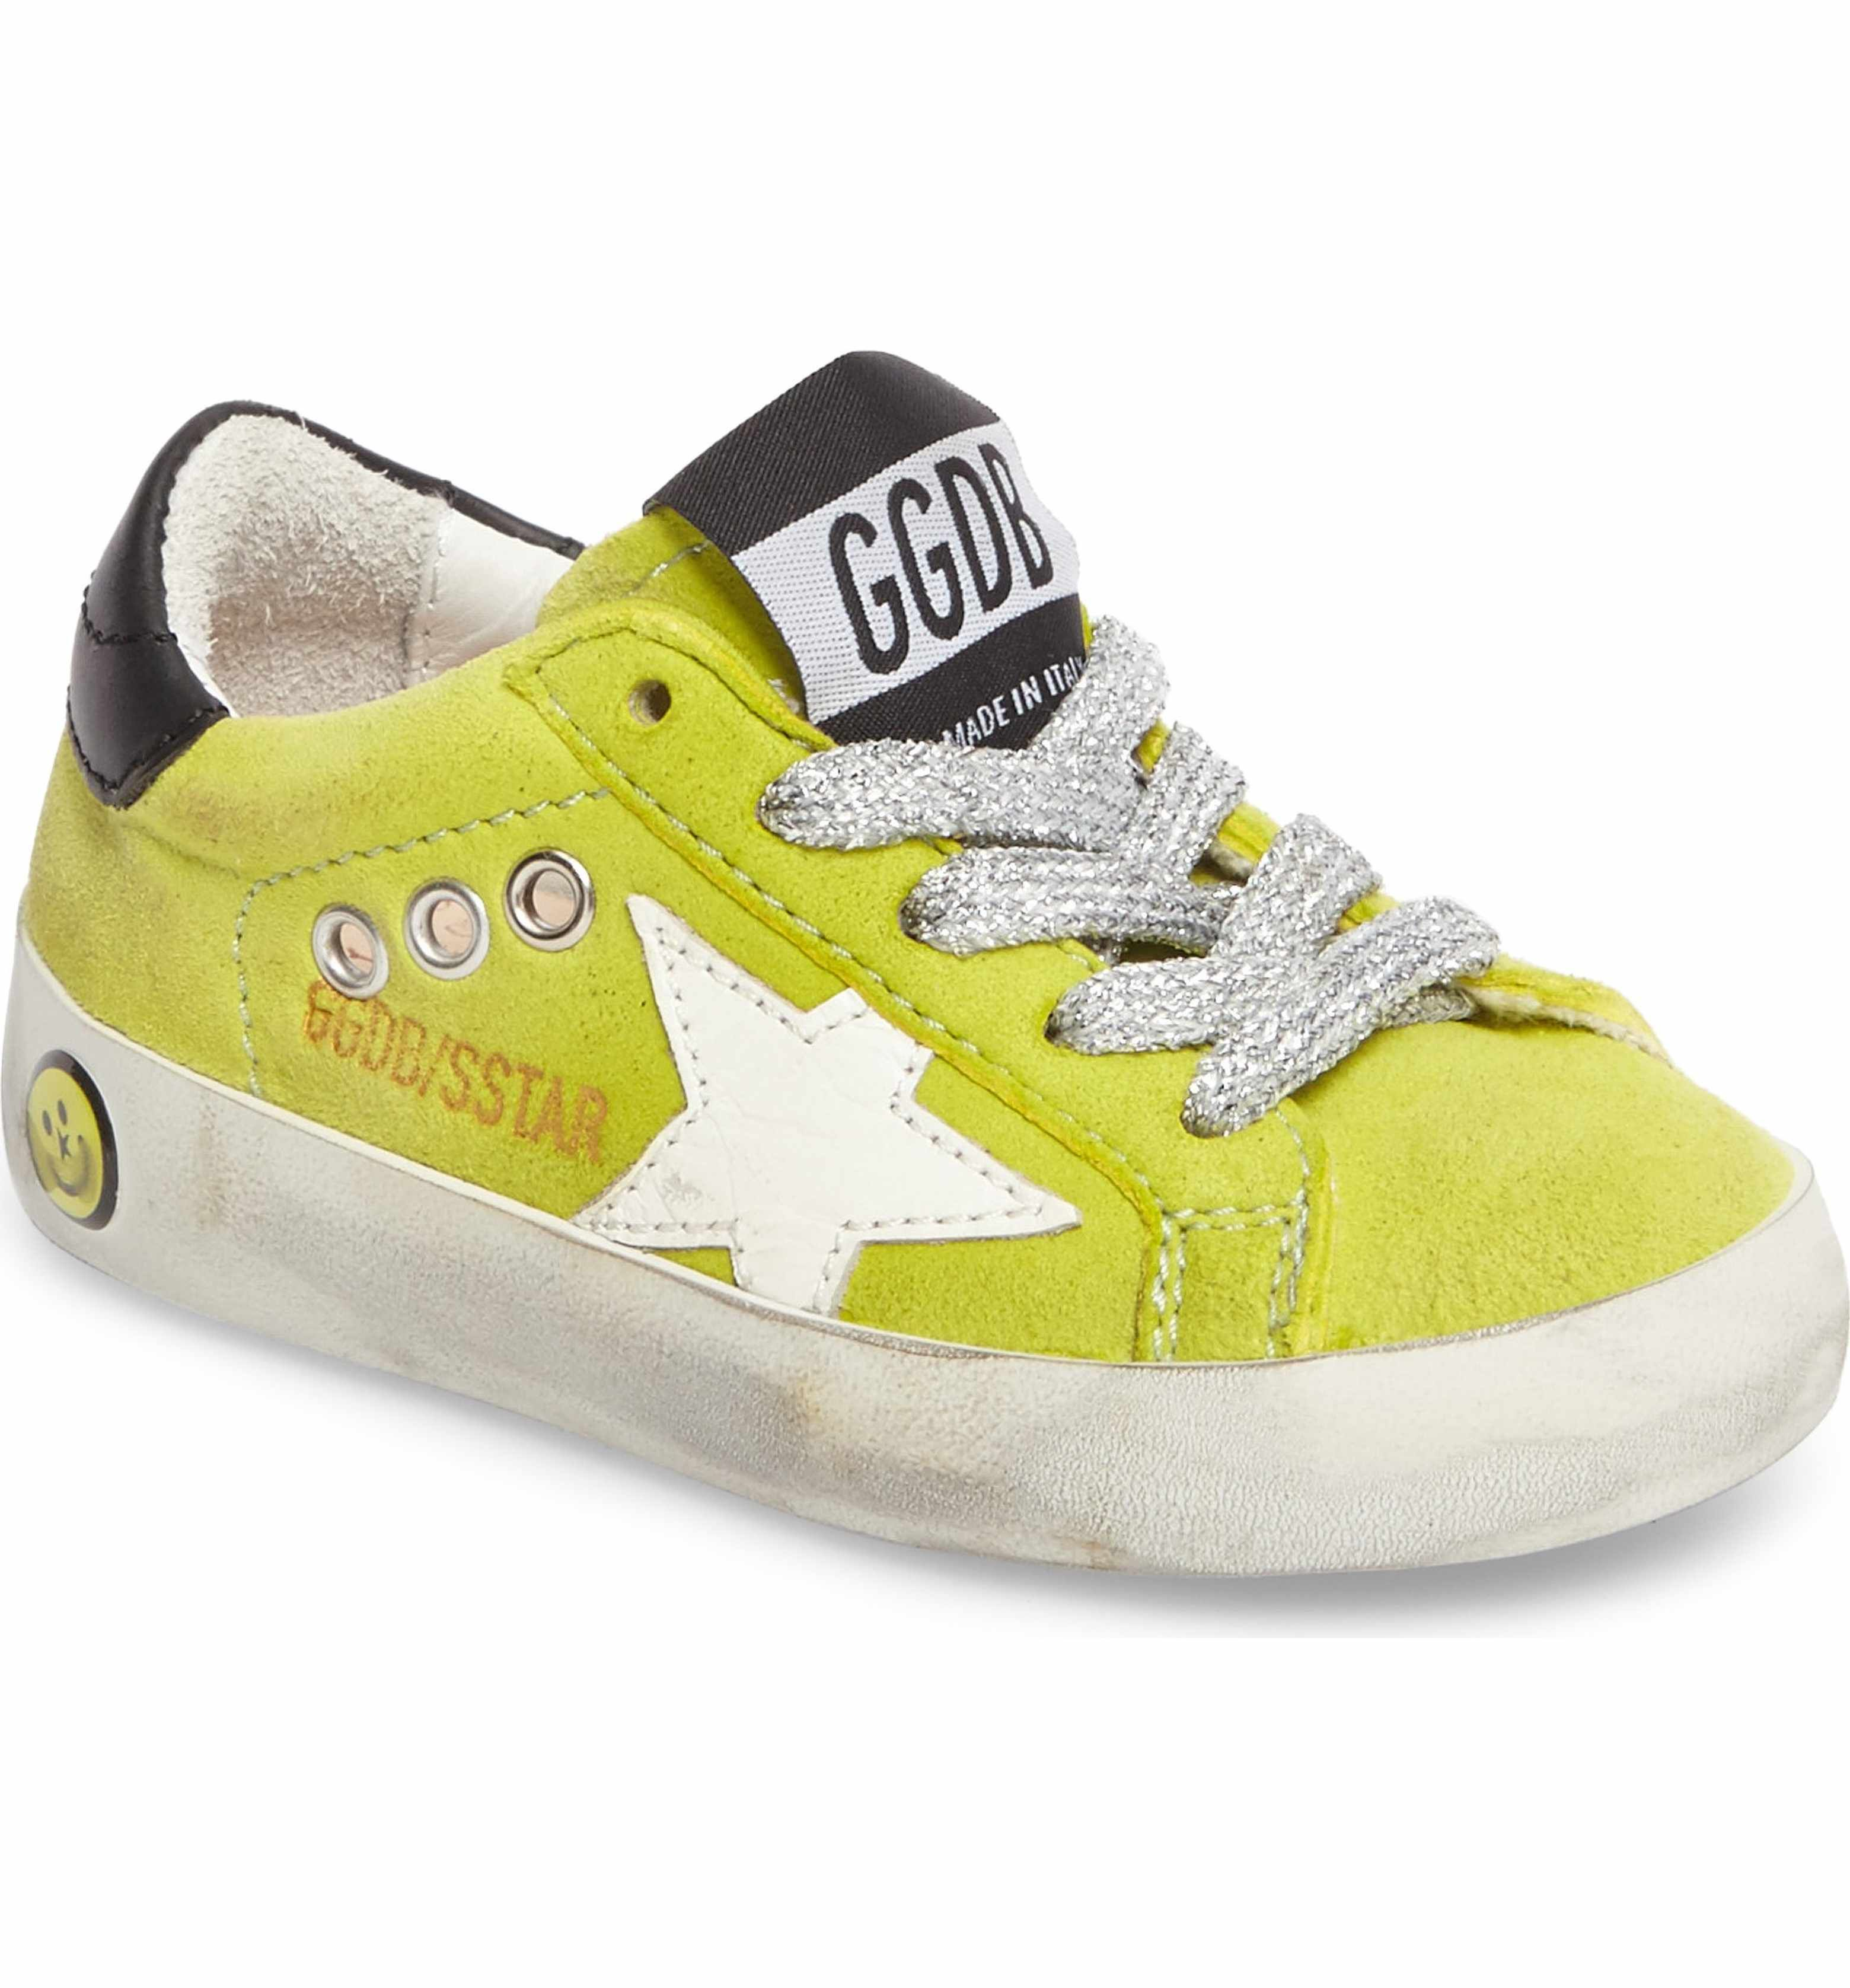 b8a98044ba1d Main Image - Golden Goose Superstar Low Top Sneaker (Baby